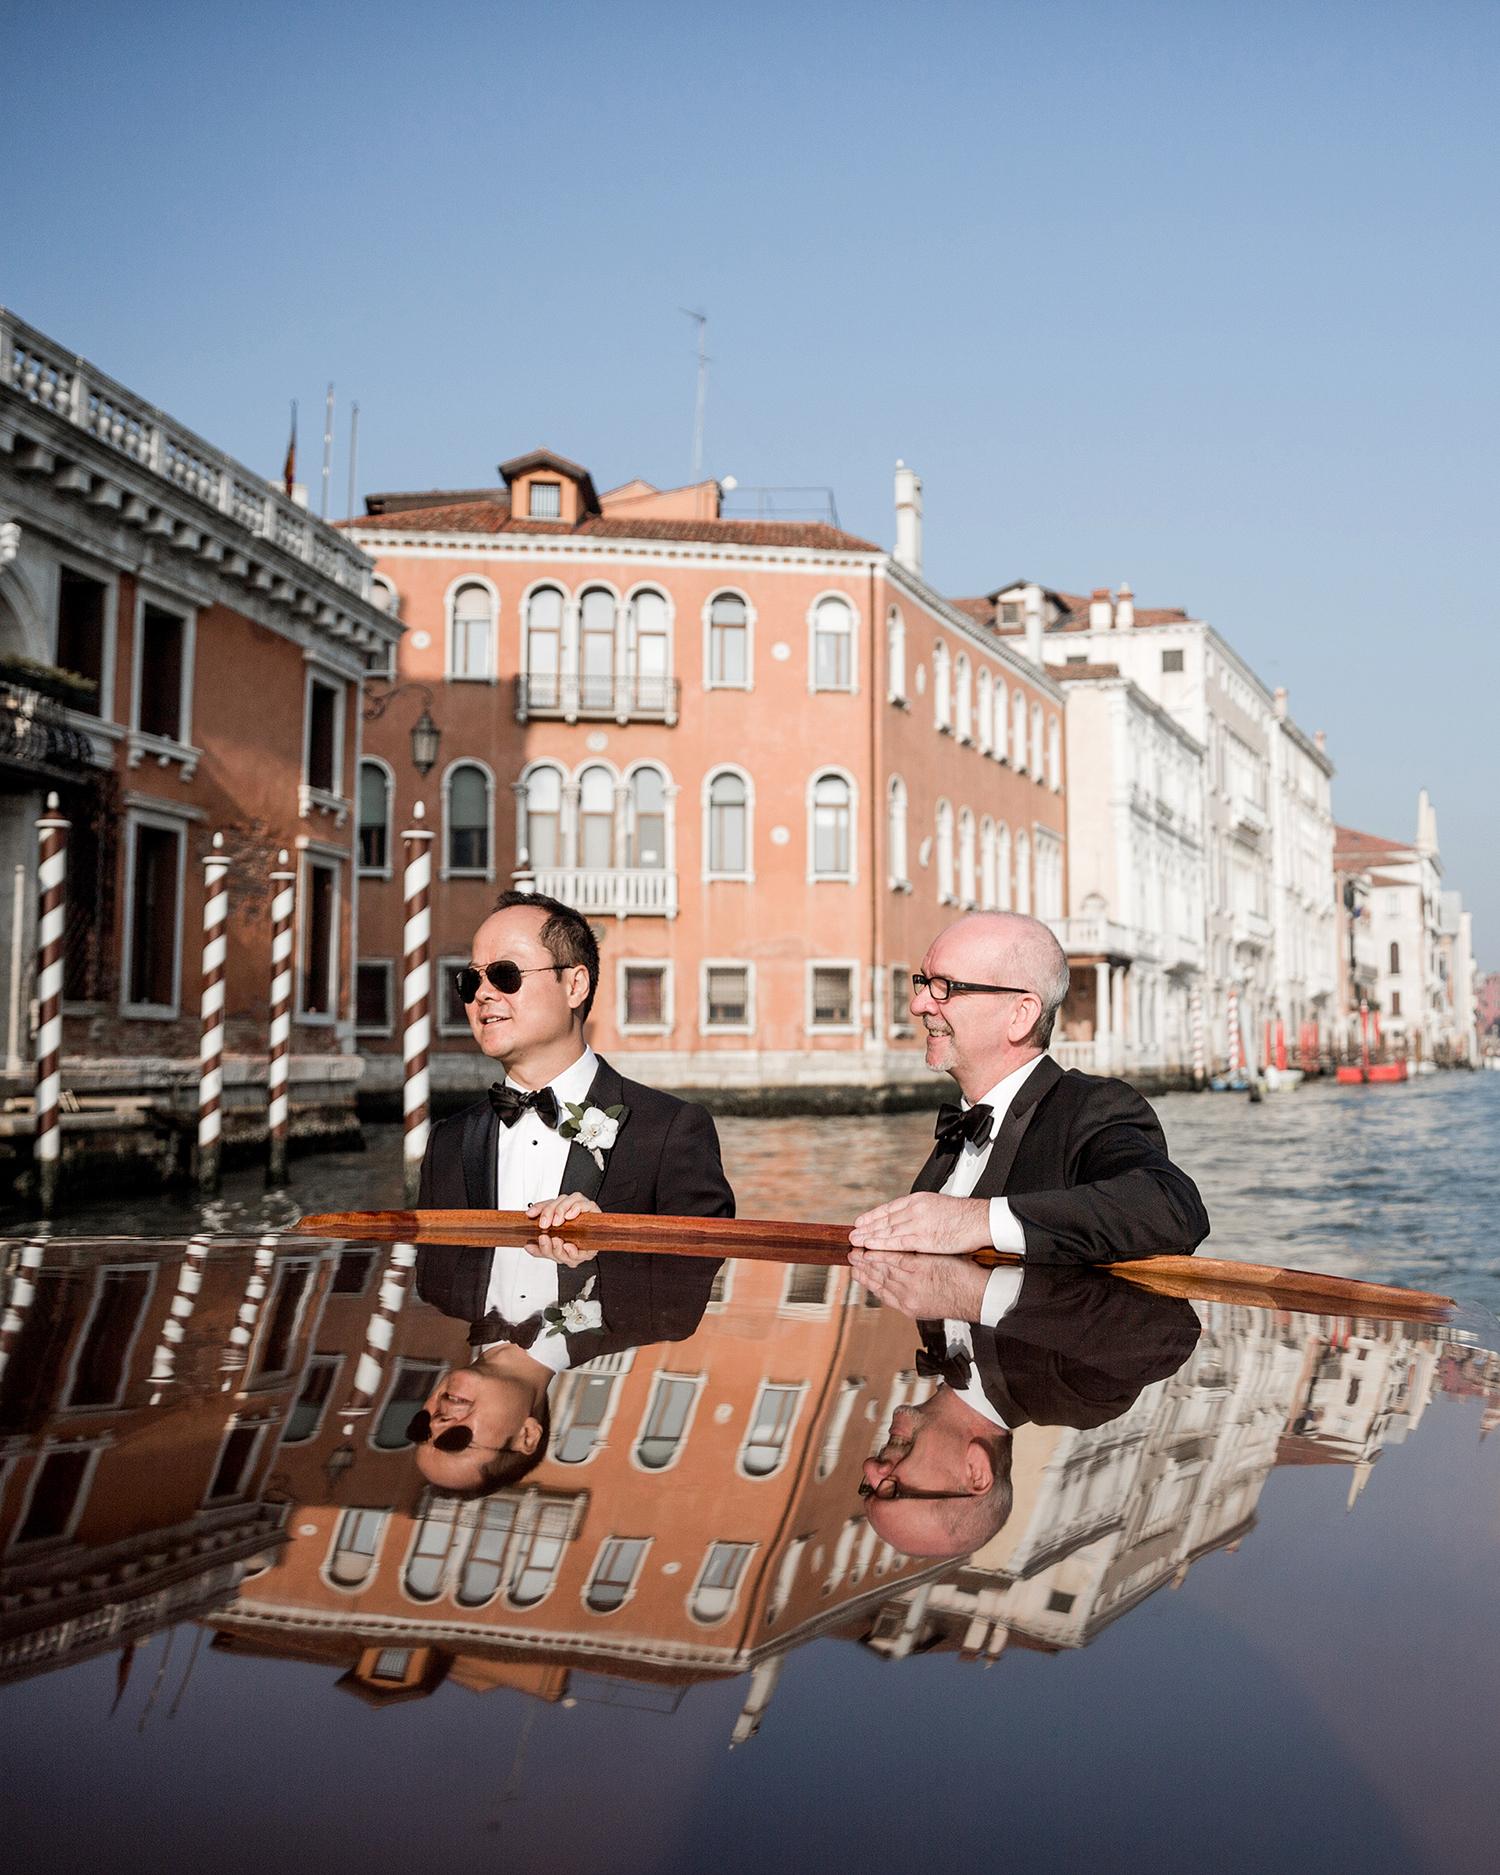 elle raymond venice wedding groom in boat